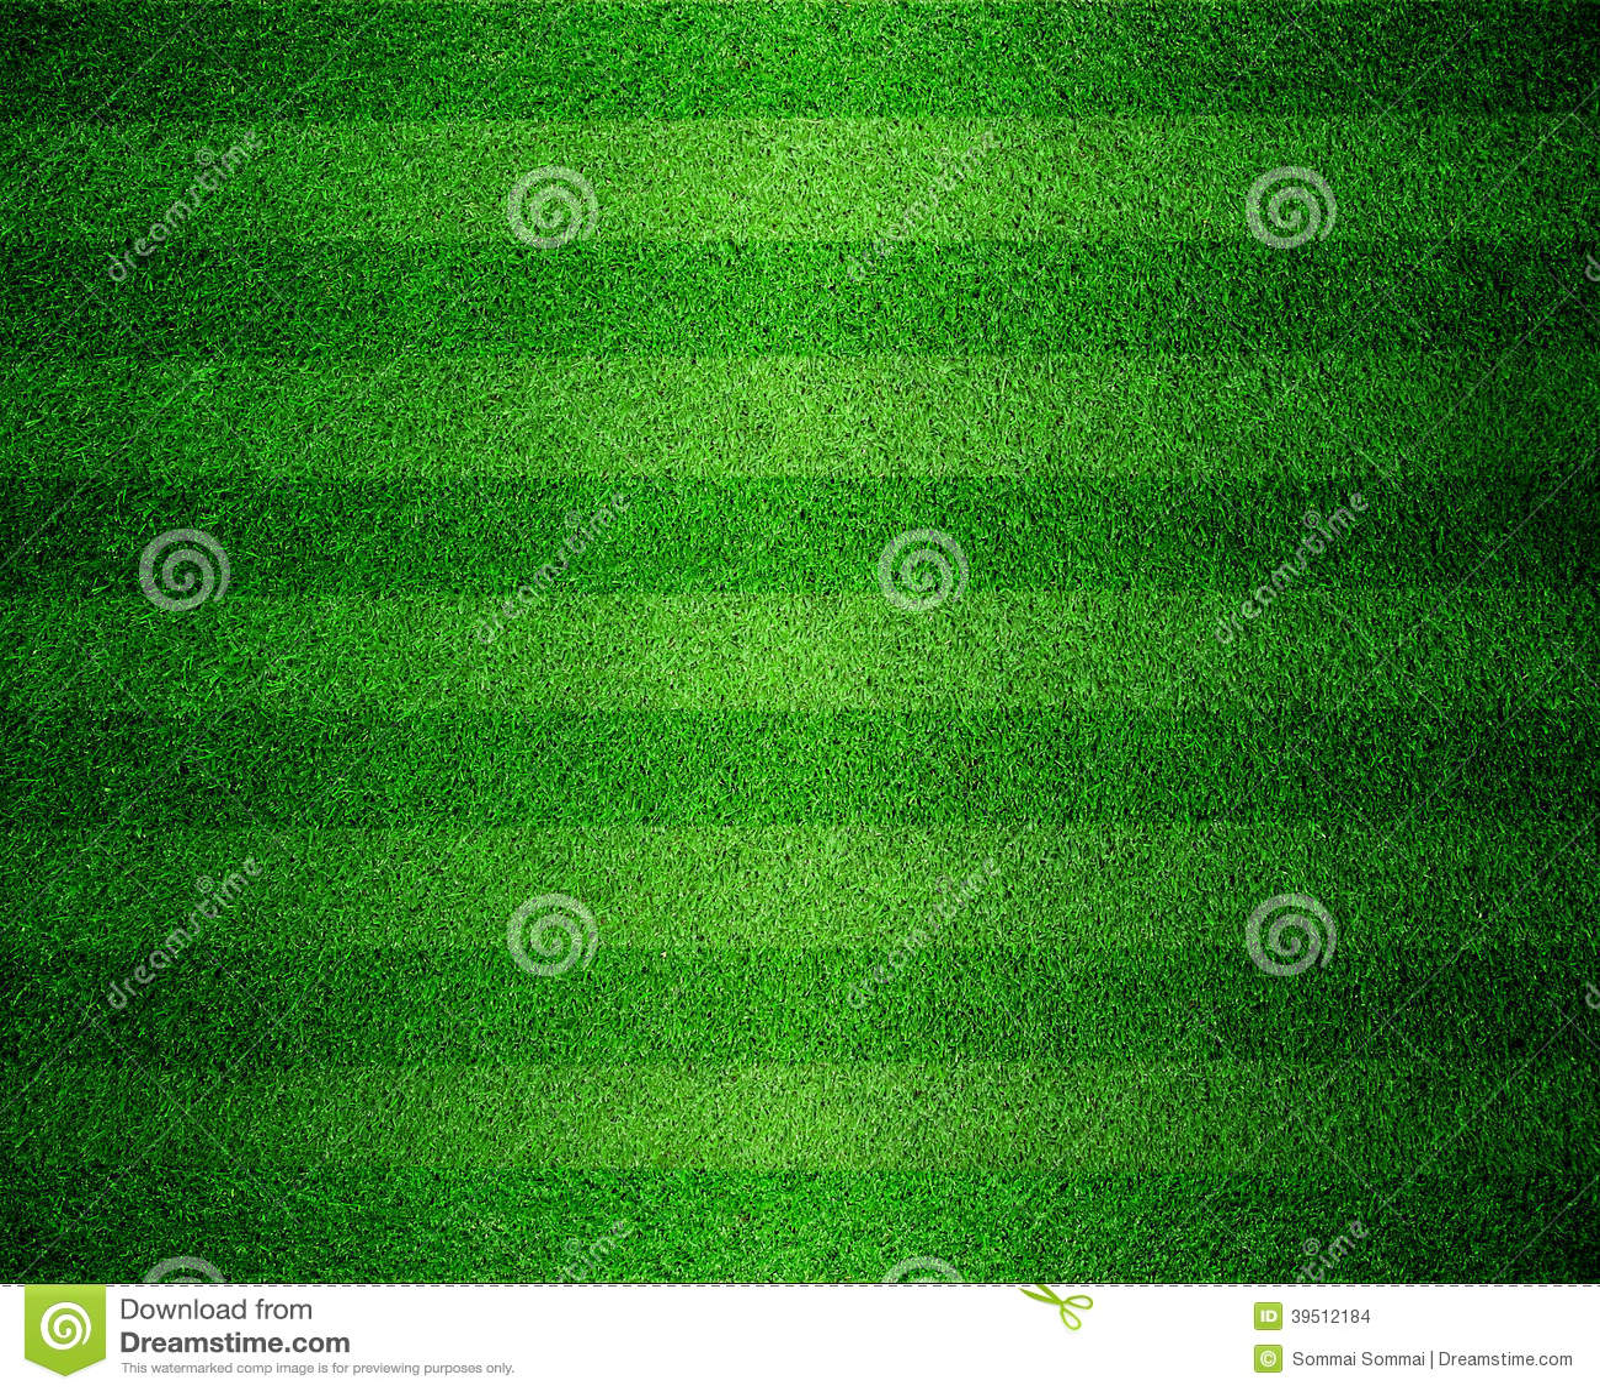 Green lined football field